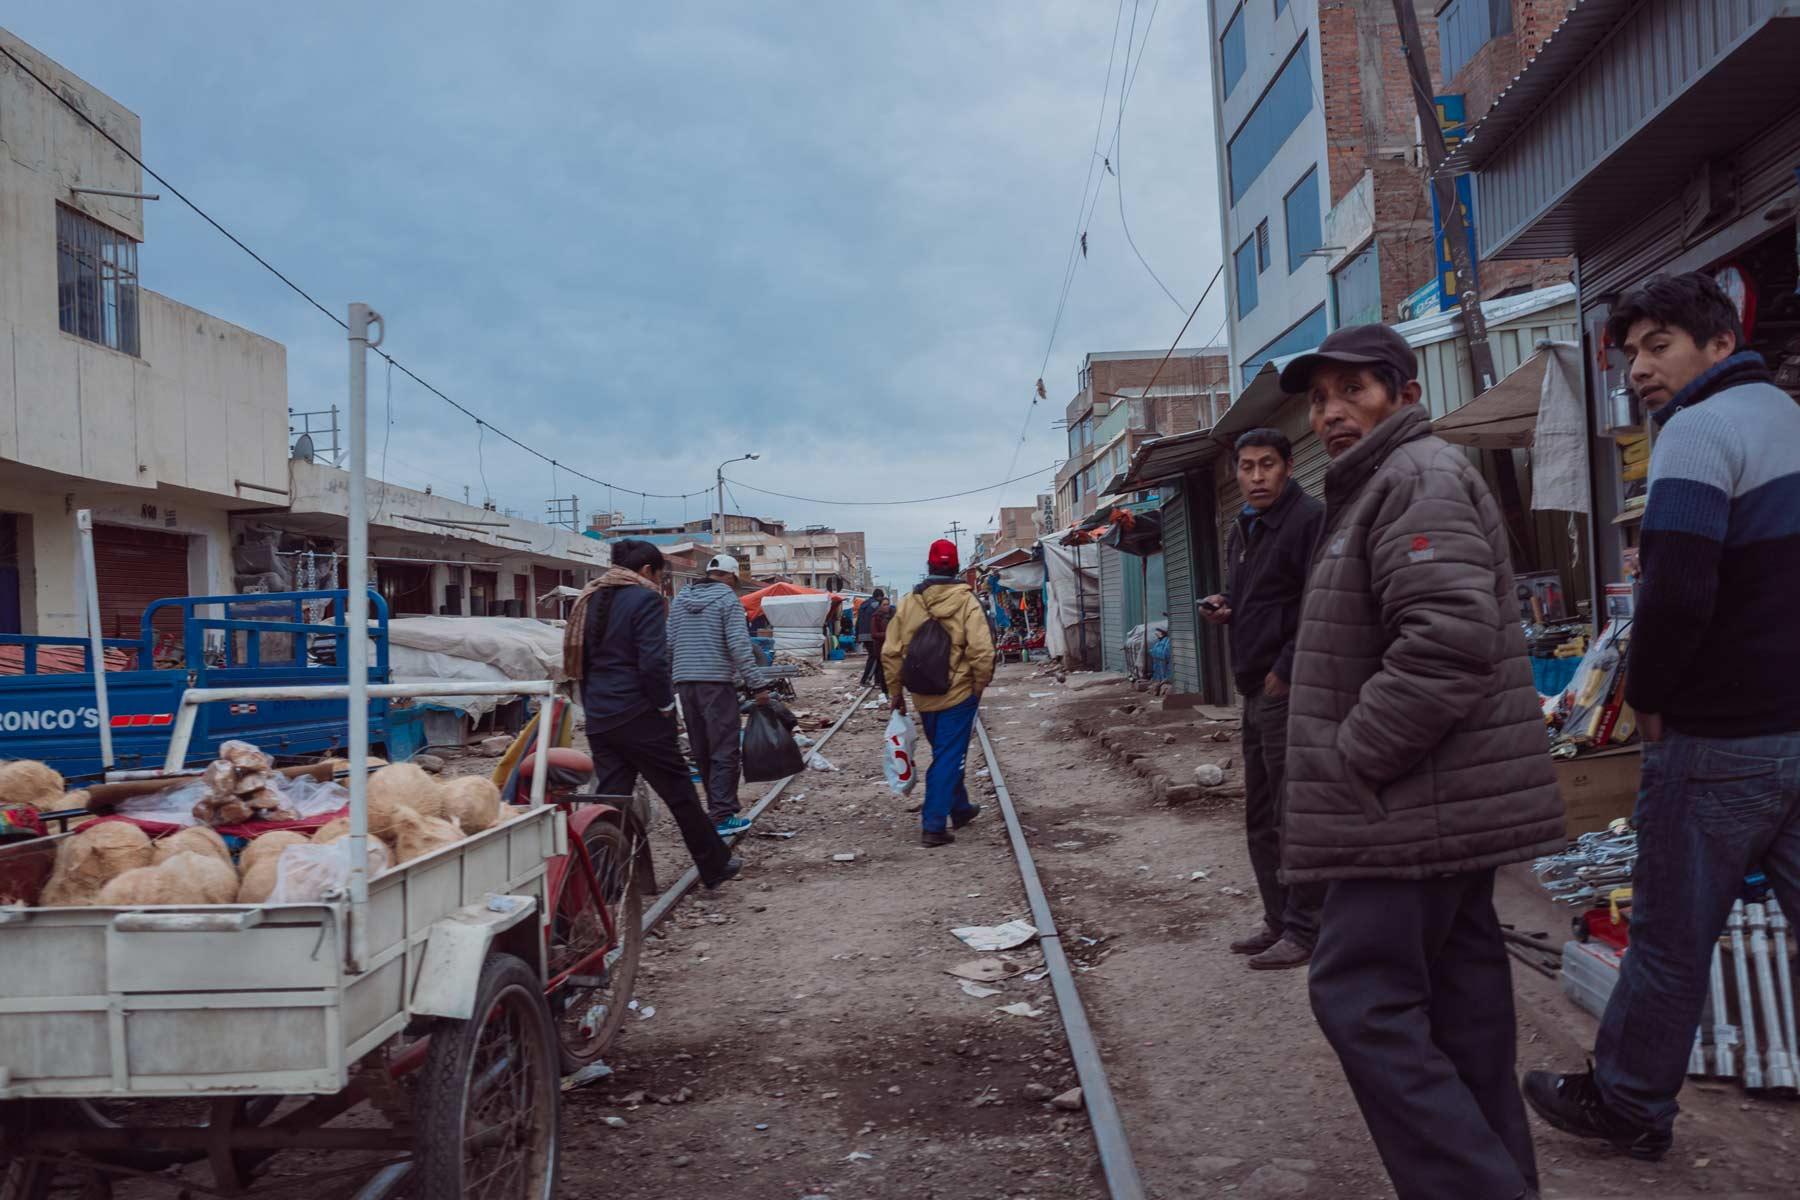 Men walk to work through an outdoor market along Peru's railroad in Juliaca.